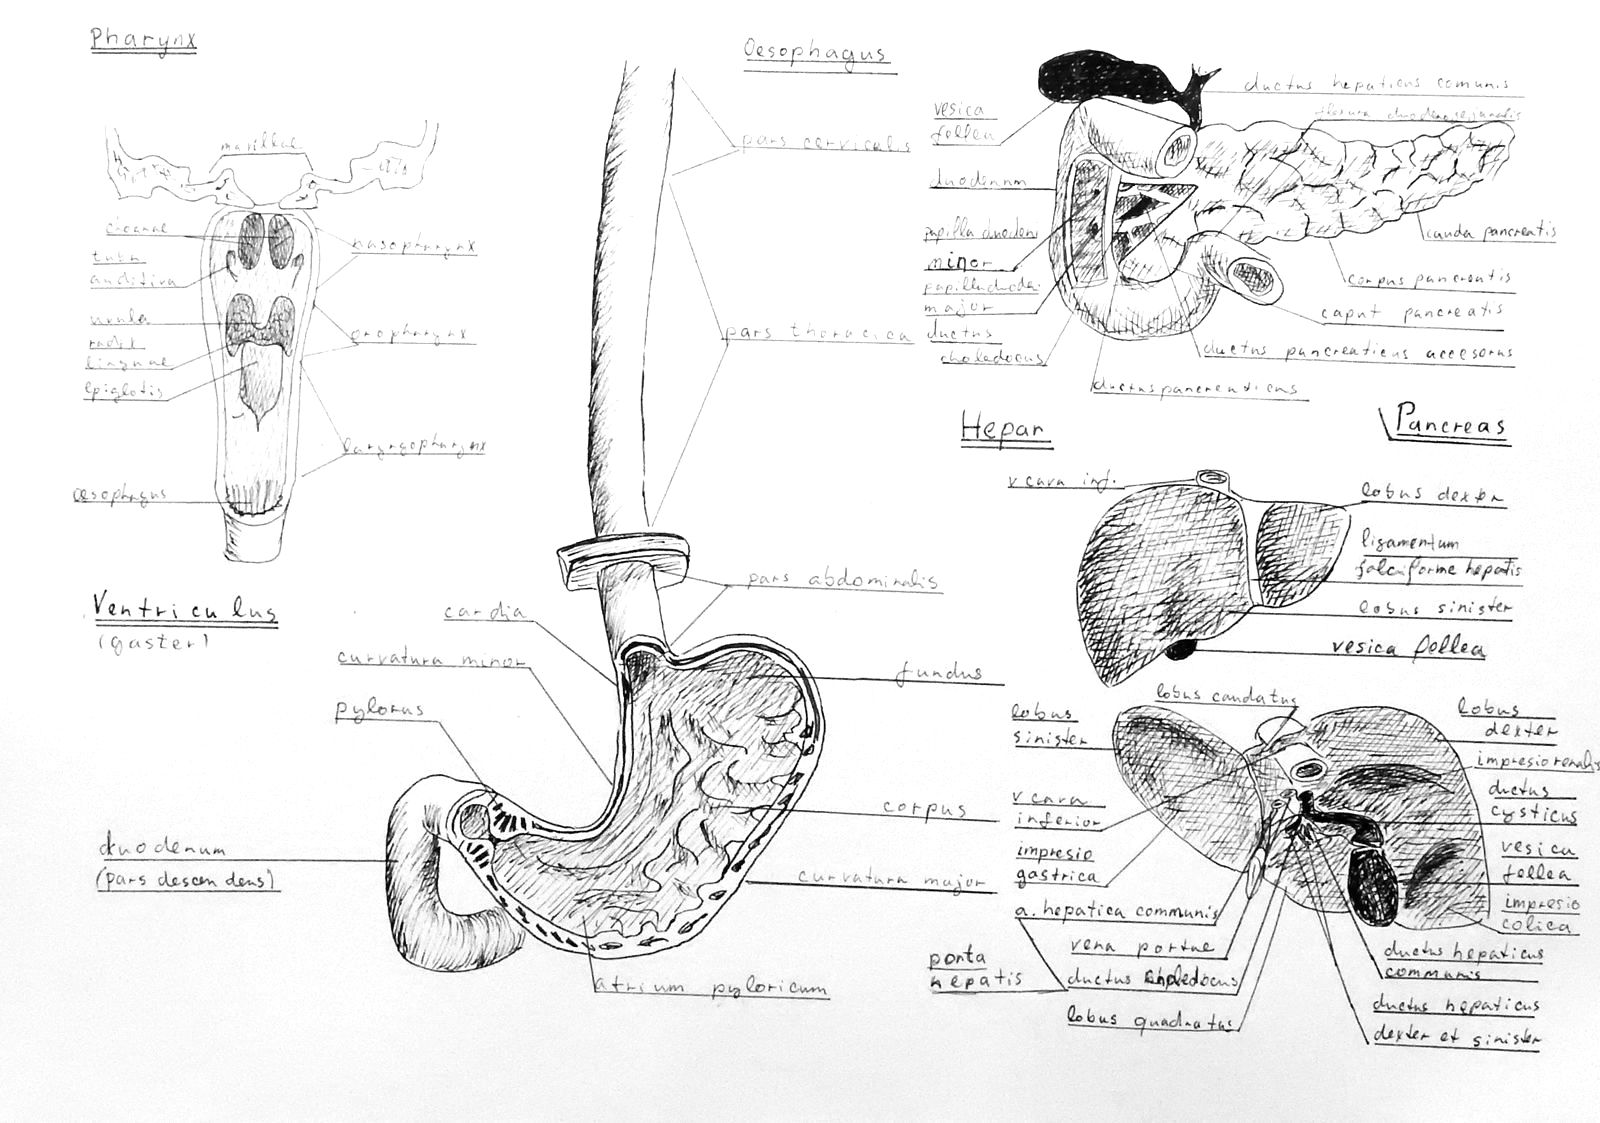 Anatomy Atlas Part 12 – Liver, Spleen, Stomach